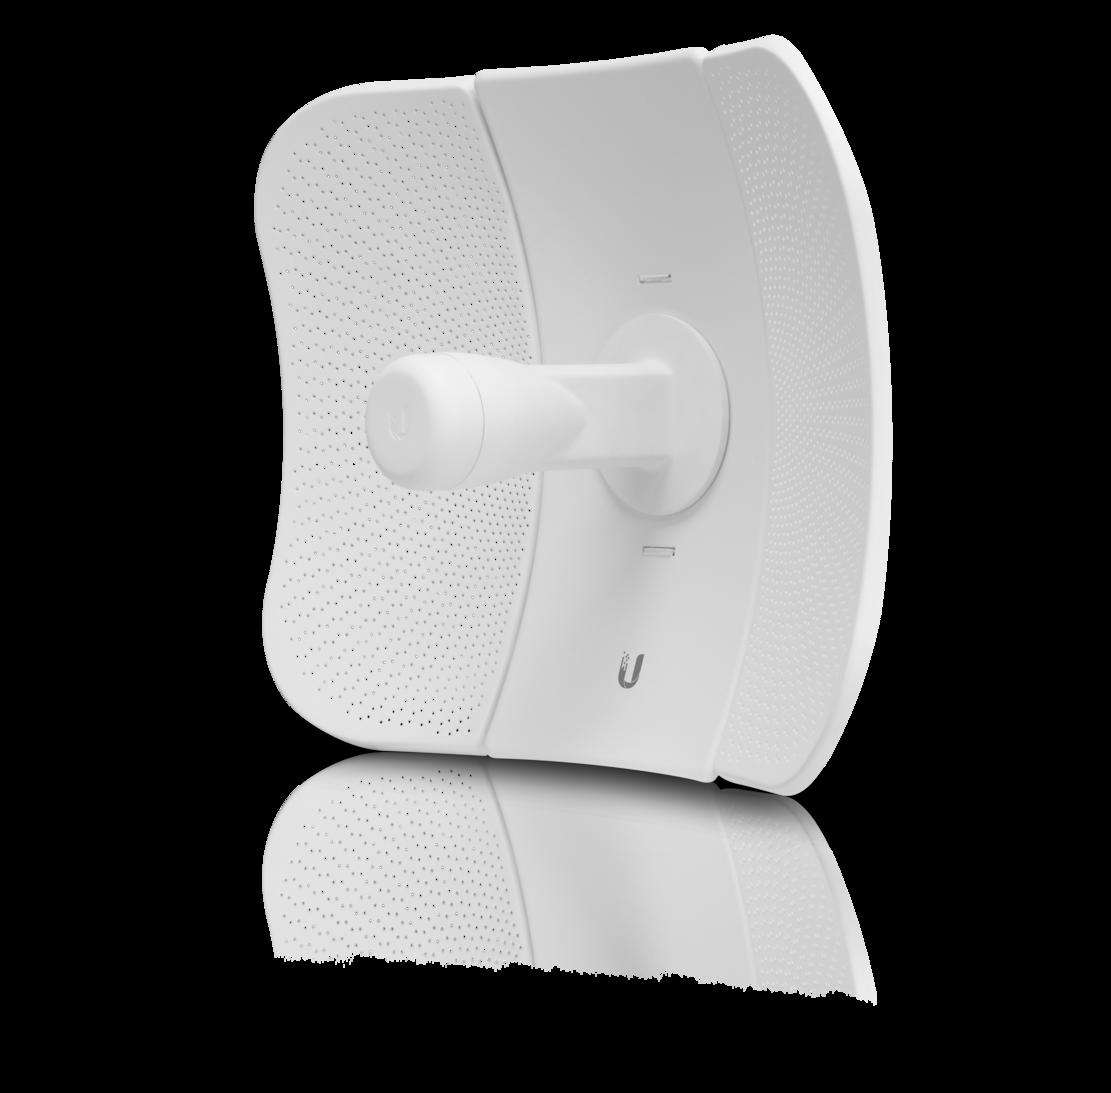 LBE-5AC-23 Ubiquiti LiteBeam 5AC 5 Ghz AC 23dBi Gigabit Dış Ortam PTP / PTMP